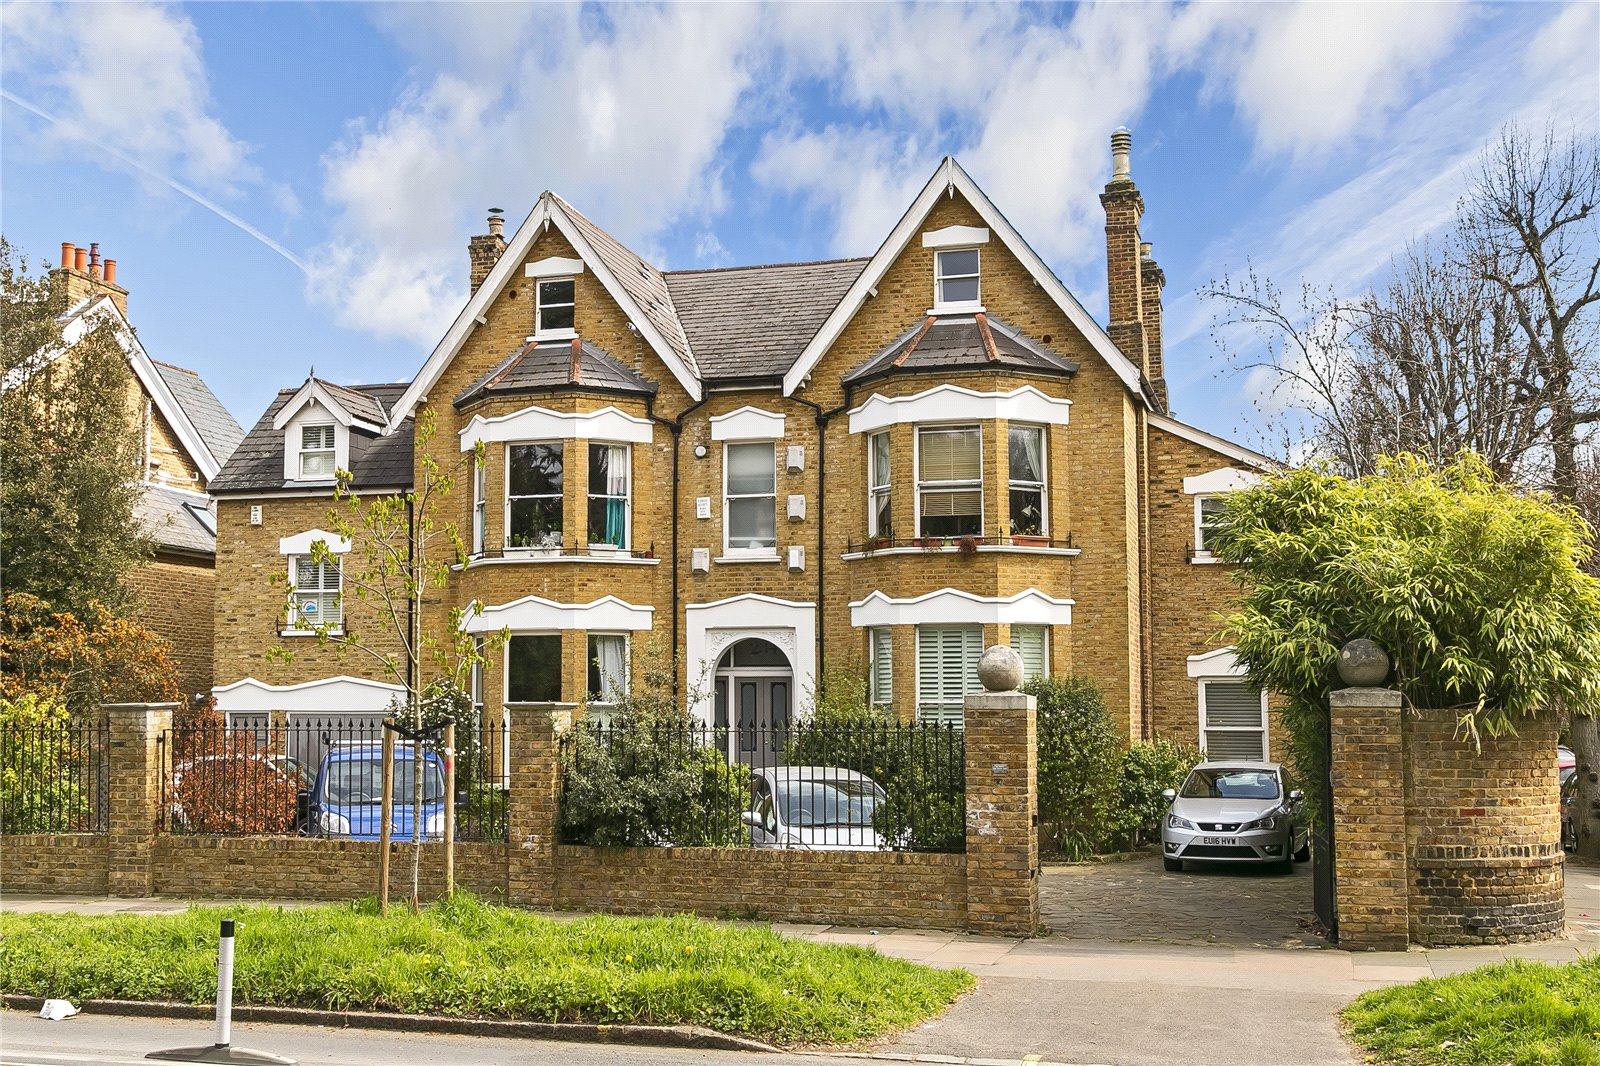 Kew Road, Kew, TW9 3JX - Antony Roberts